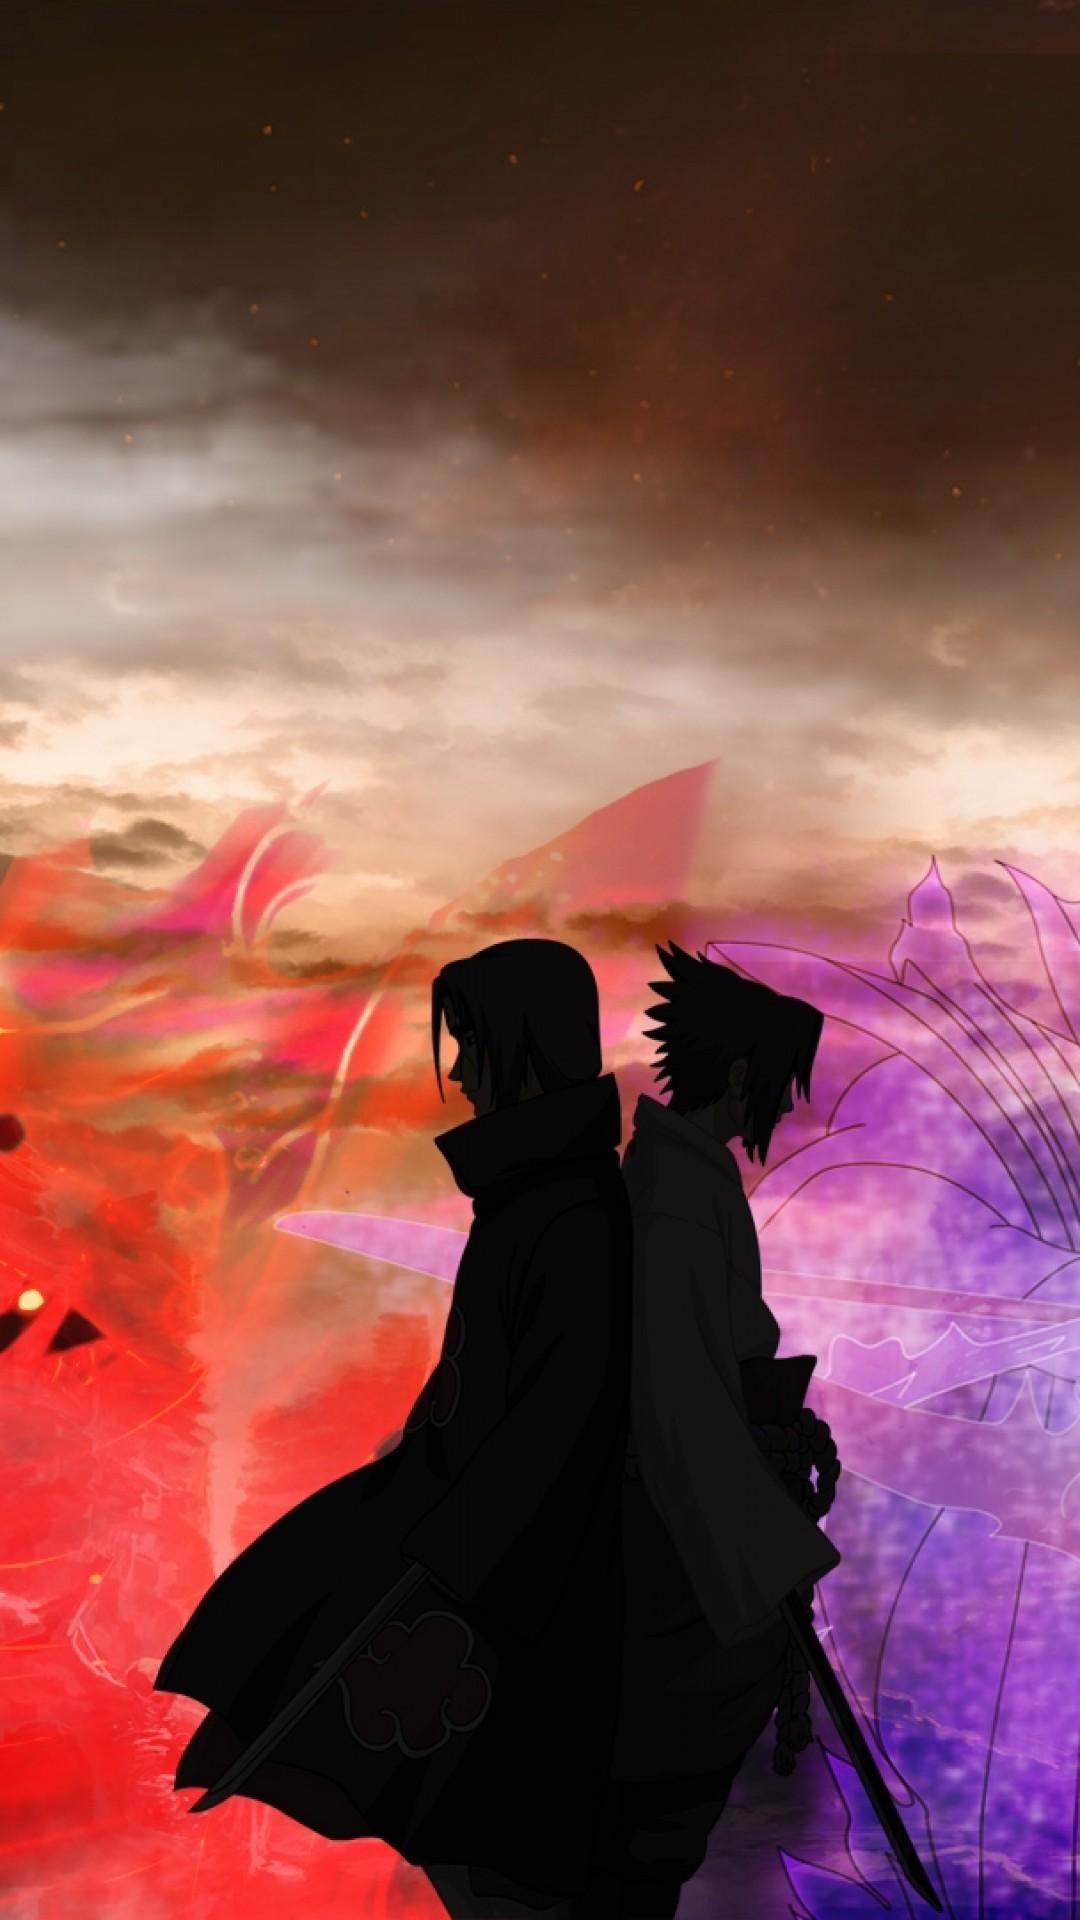 Download 1080x1920 Uchiha Itachi Uchiha Sasuke Naruto